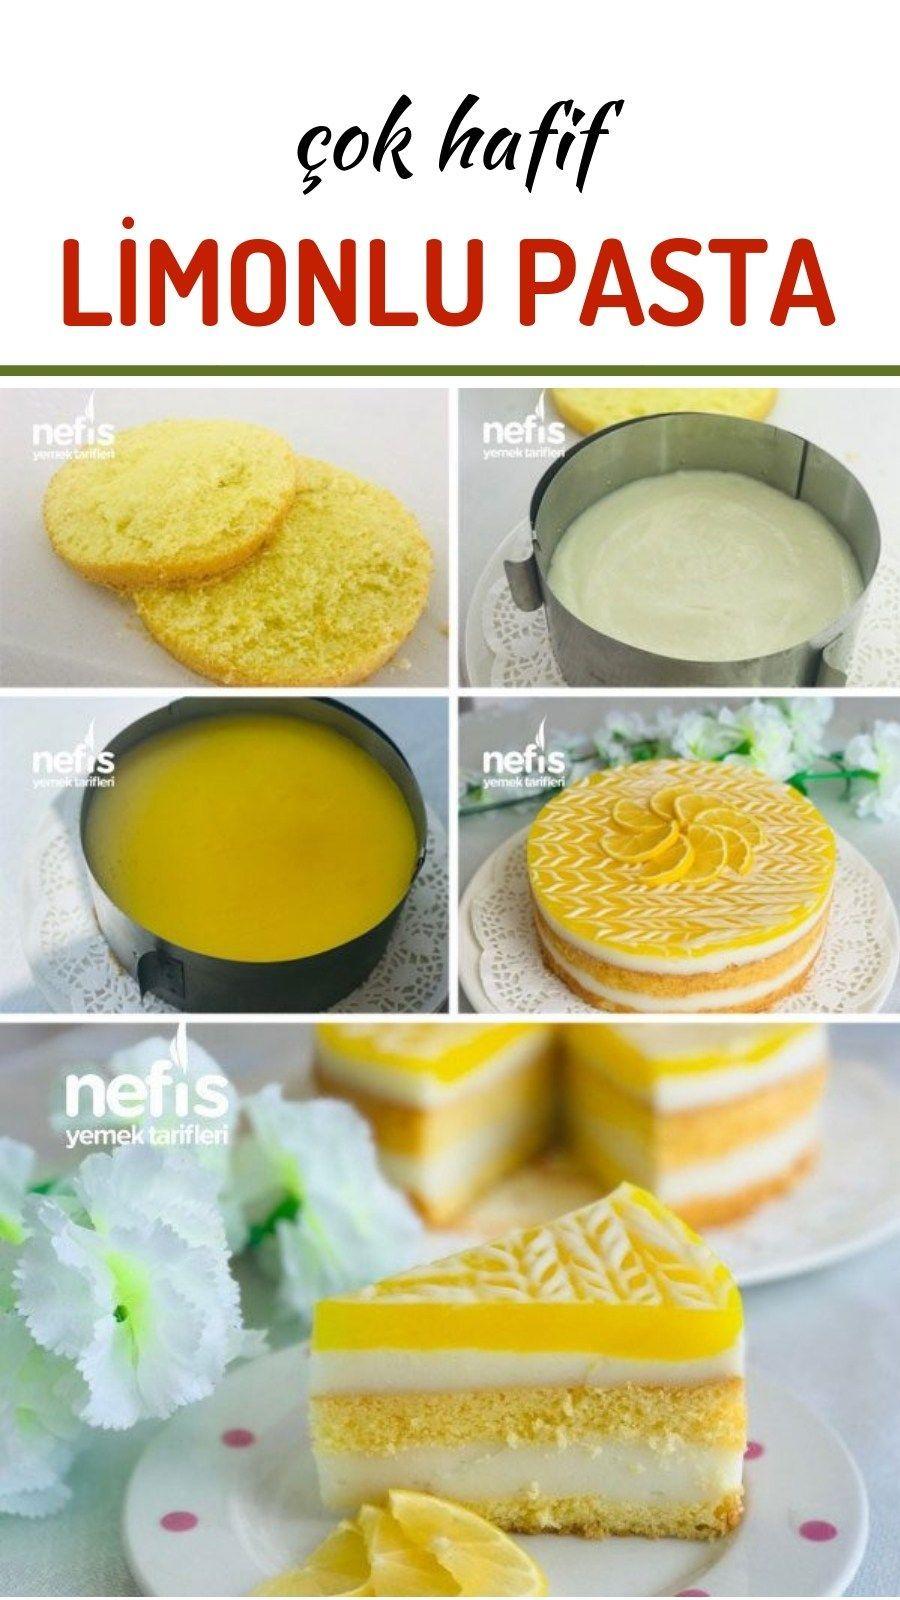 Sehr heller Zitronen-frischer Kuchen - leckere Rezepte ...